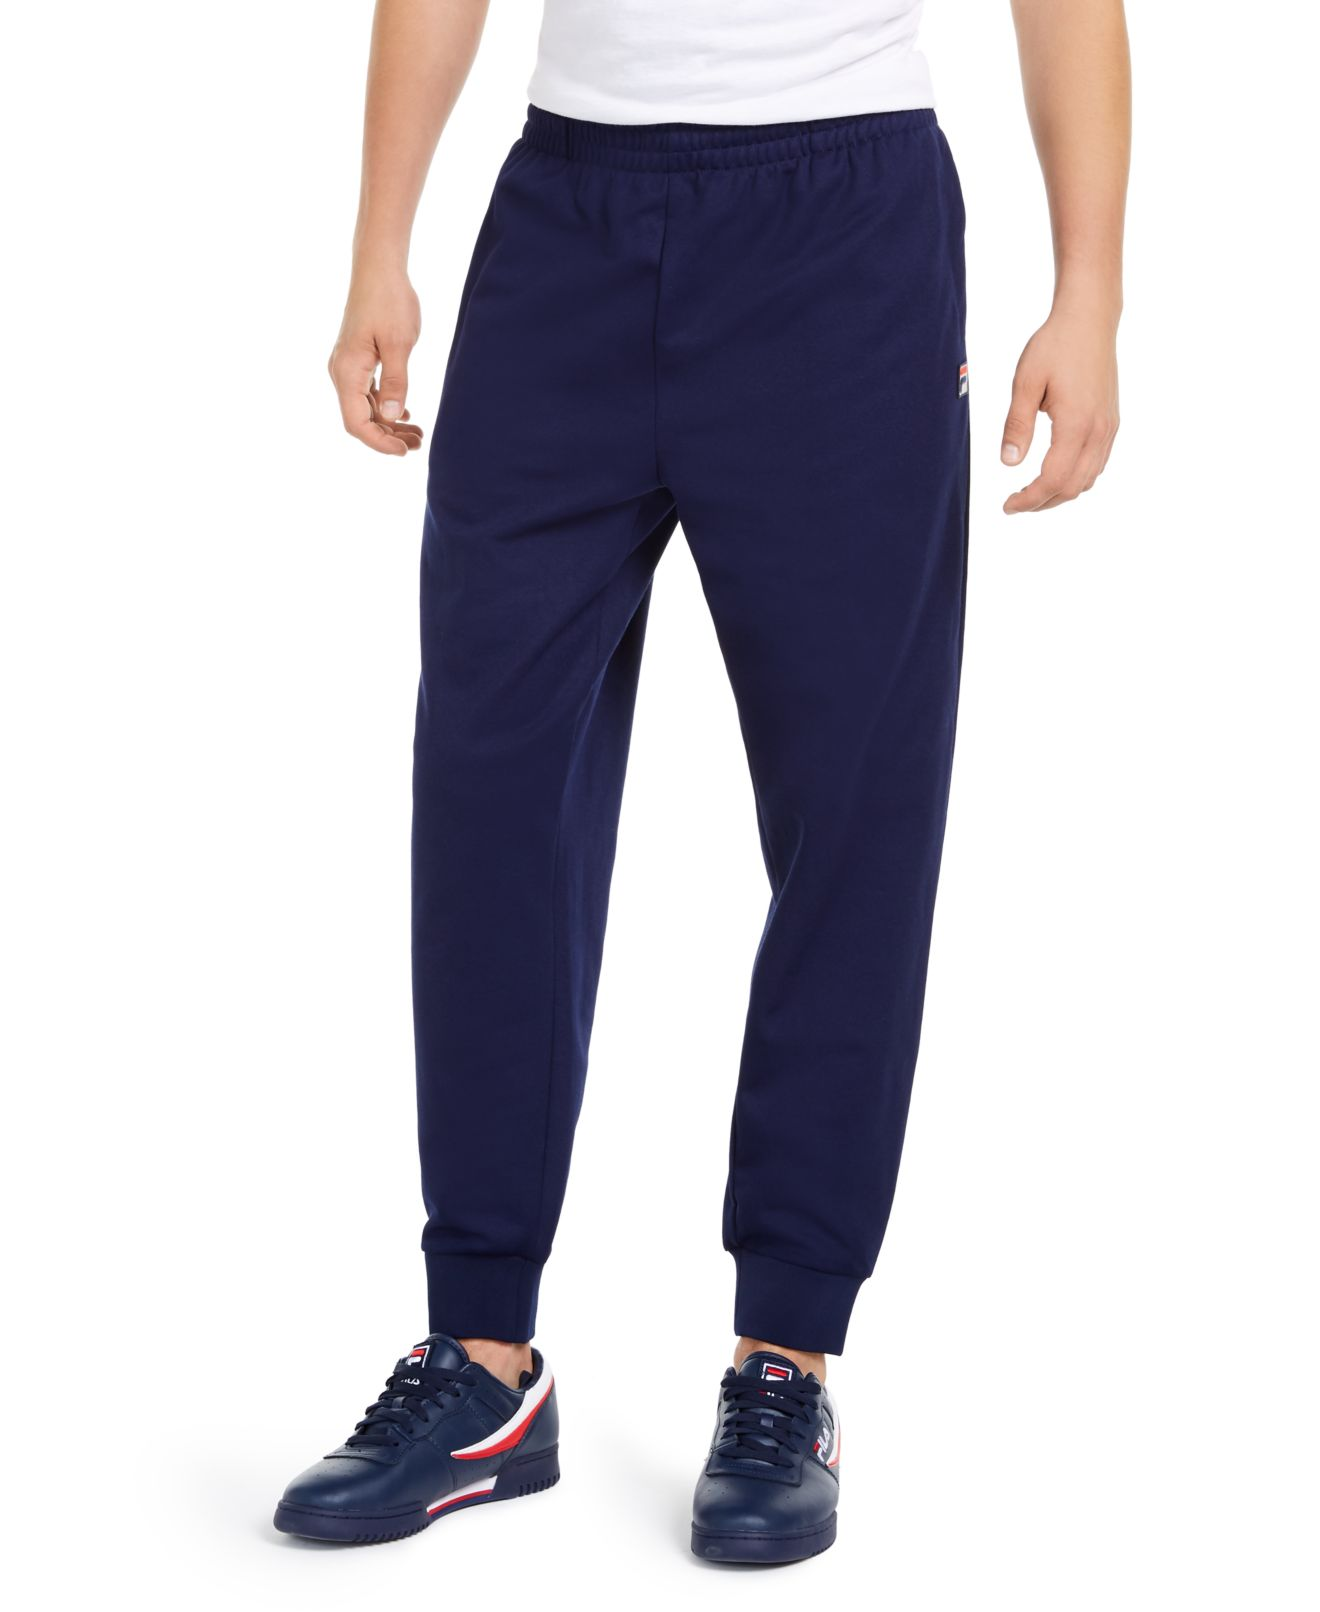 FILA Mens Pants Navy Blue Size 2XL Naso Jogger Stretch Elastic Pull-On